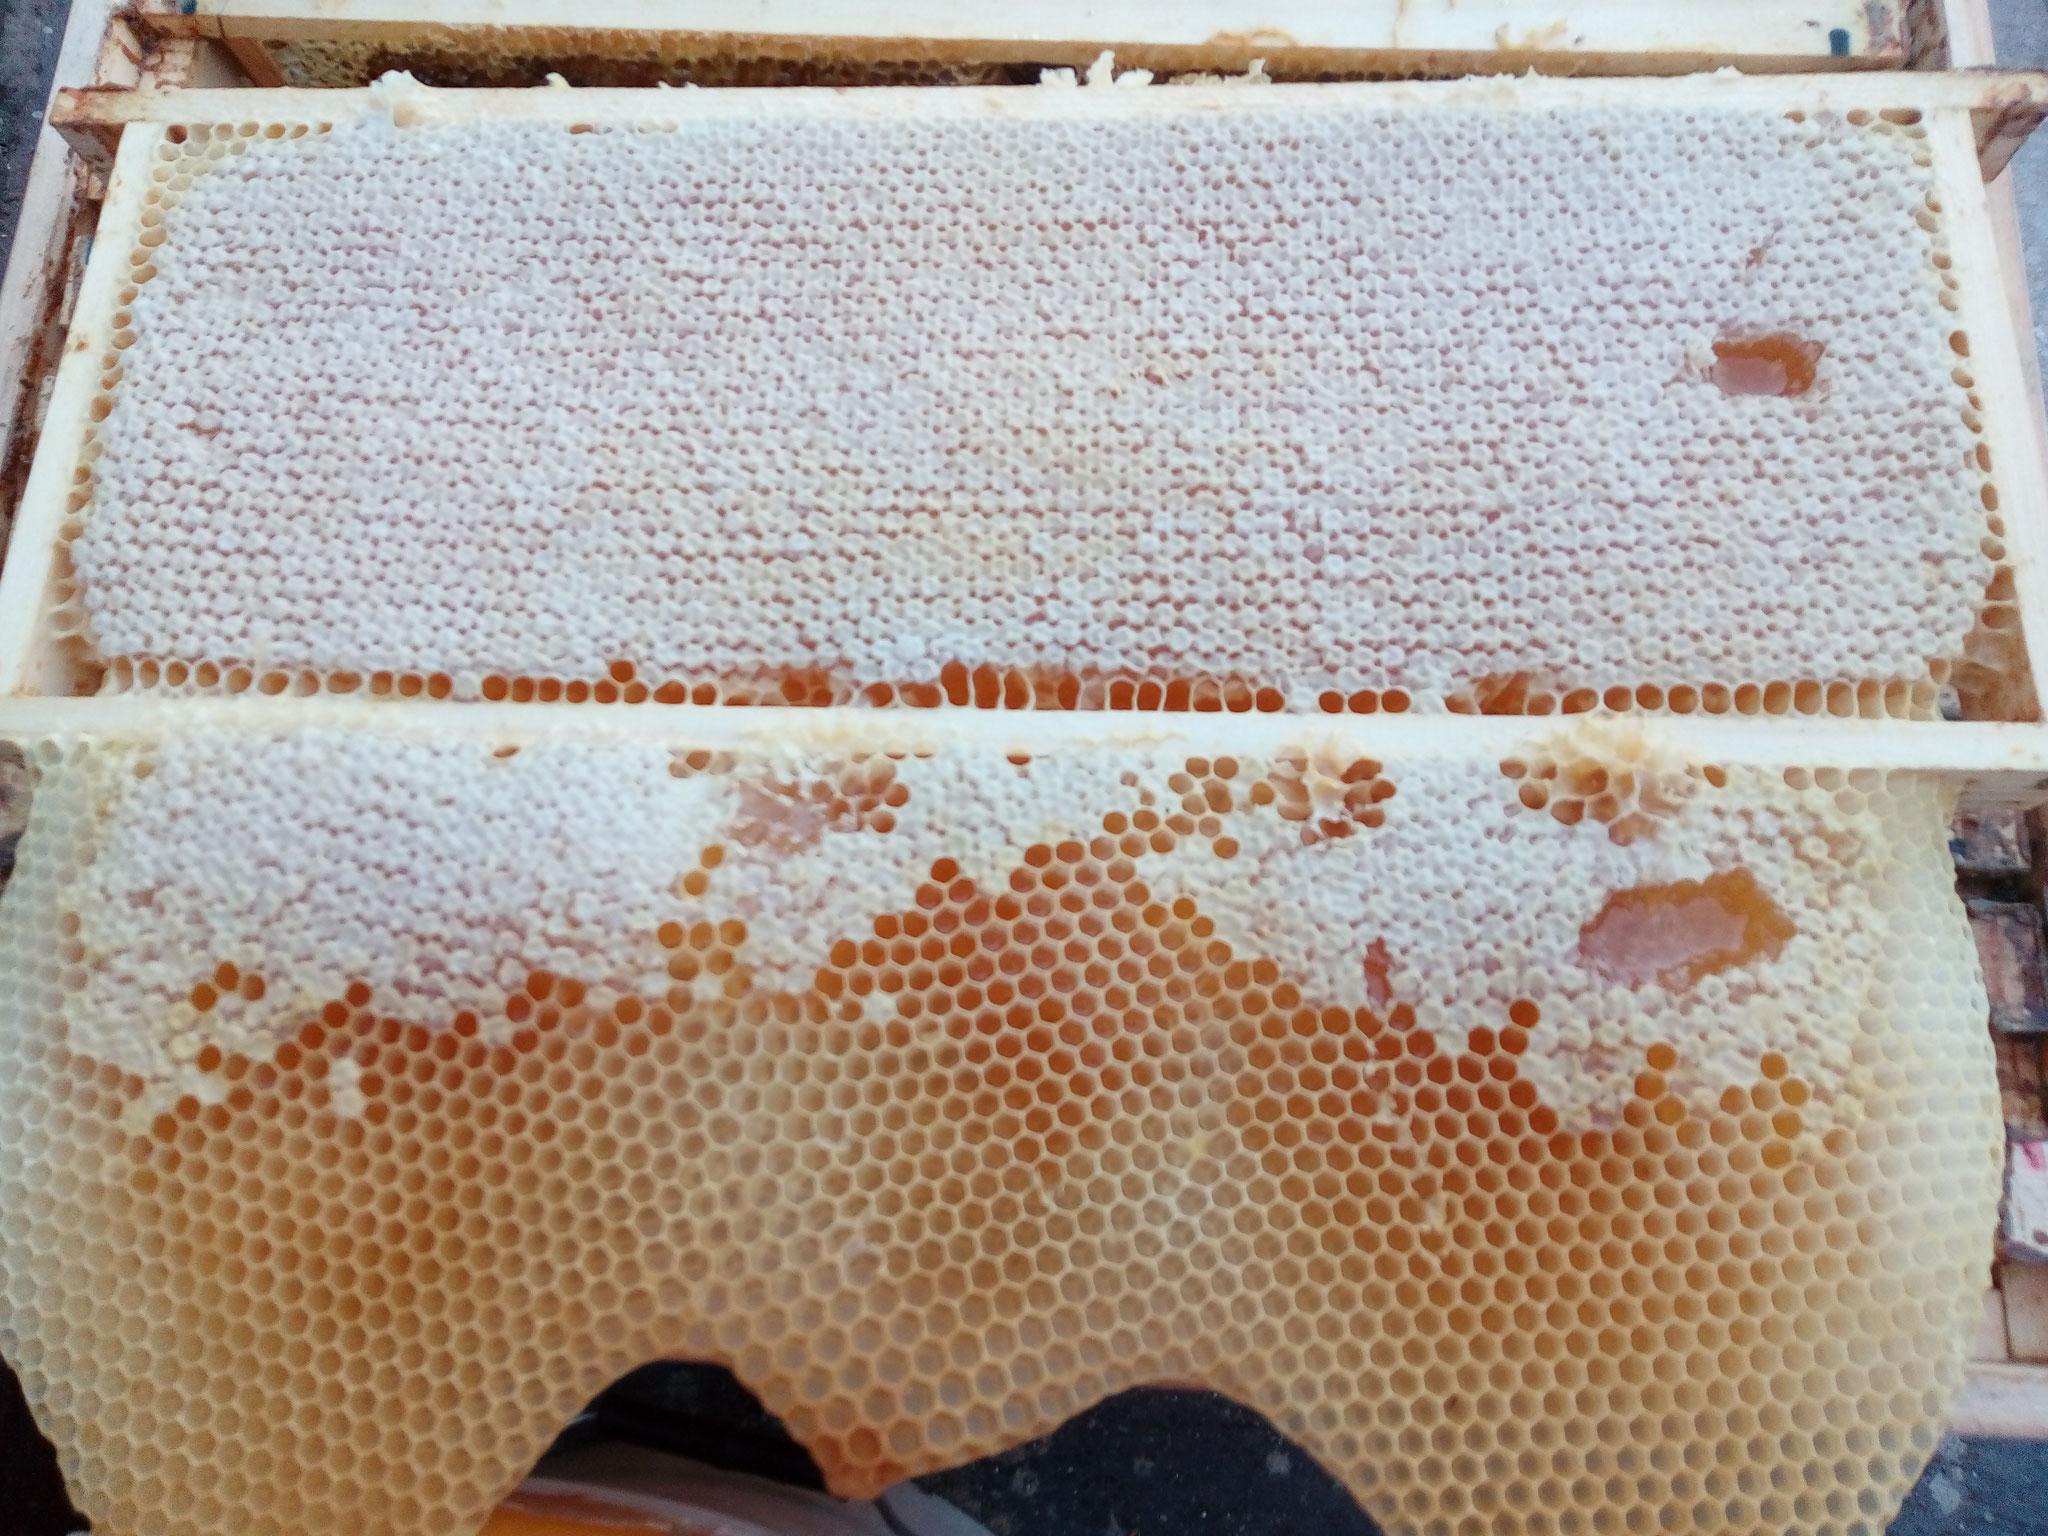 Honigwabe mit Wildbau